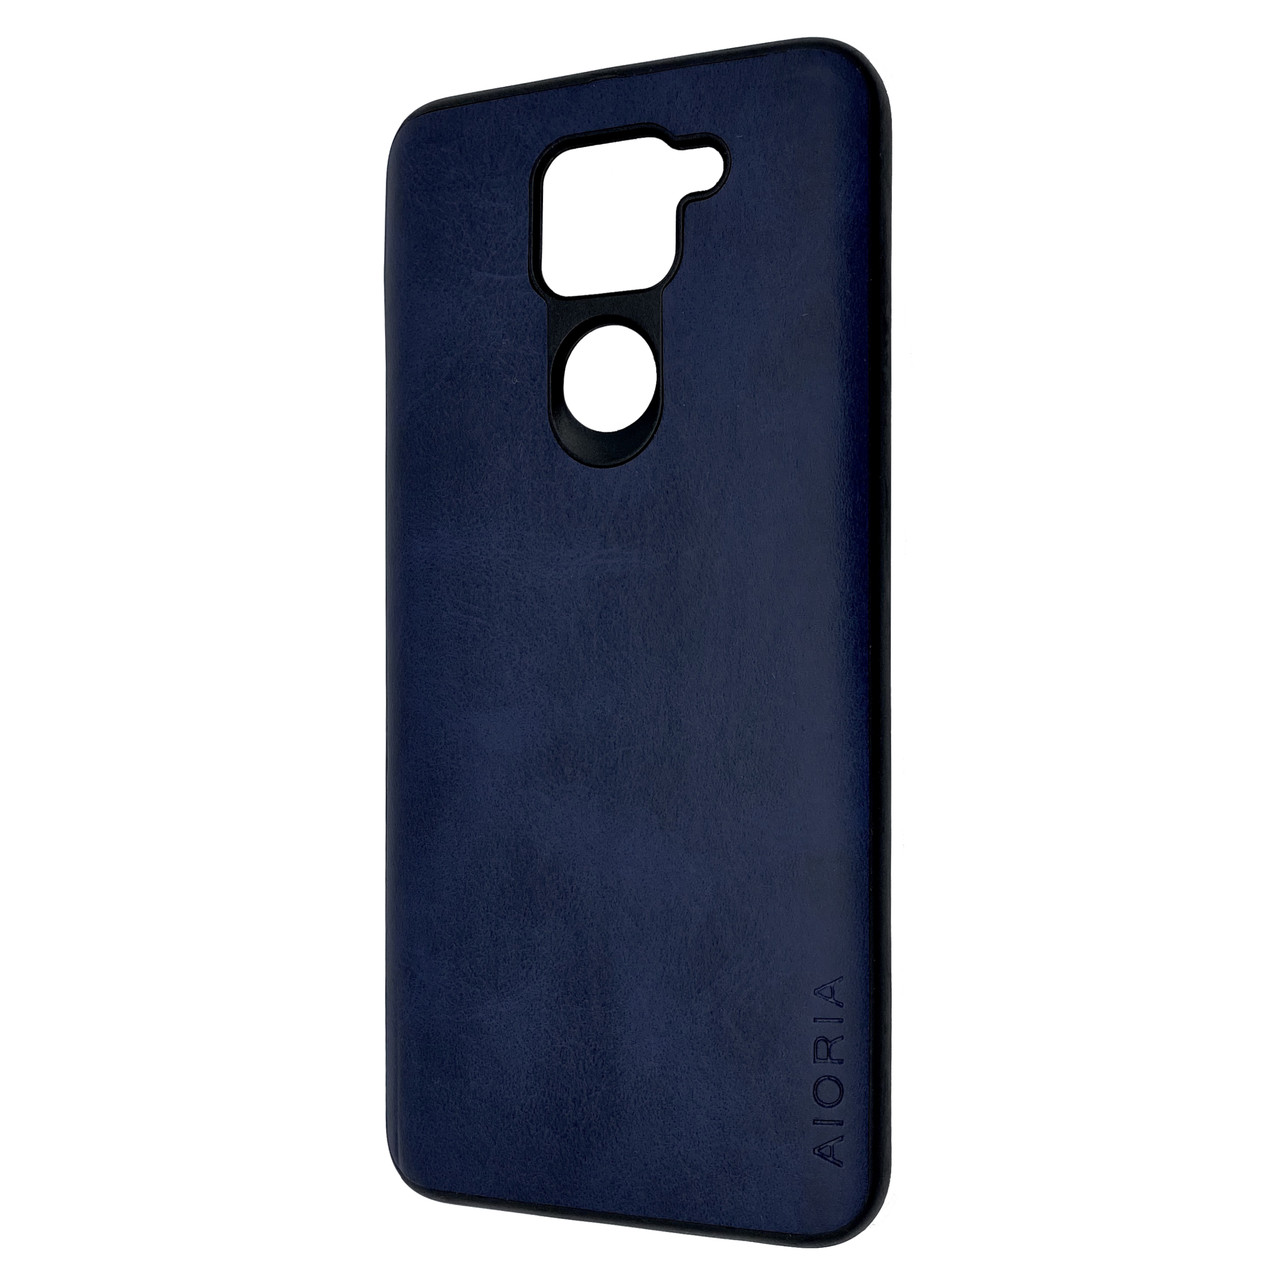 Чехол-накладка DK Silicone Form Leather Aioria для Xiaomi Redmi Note 9 (blue)